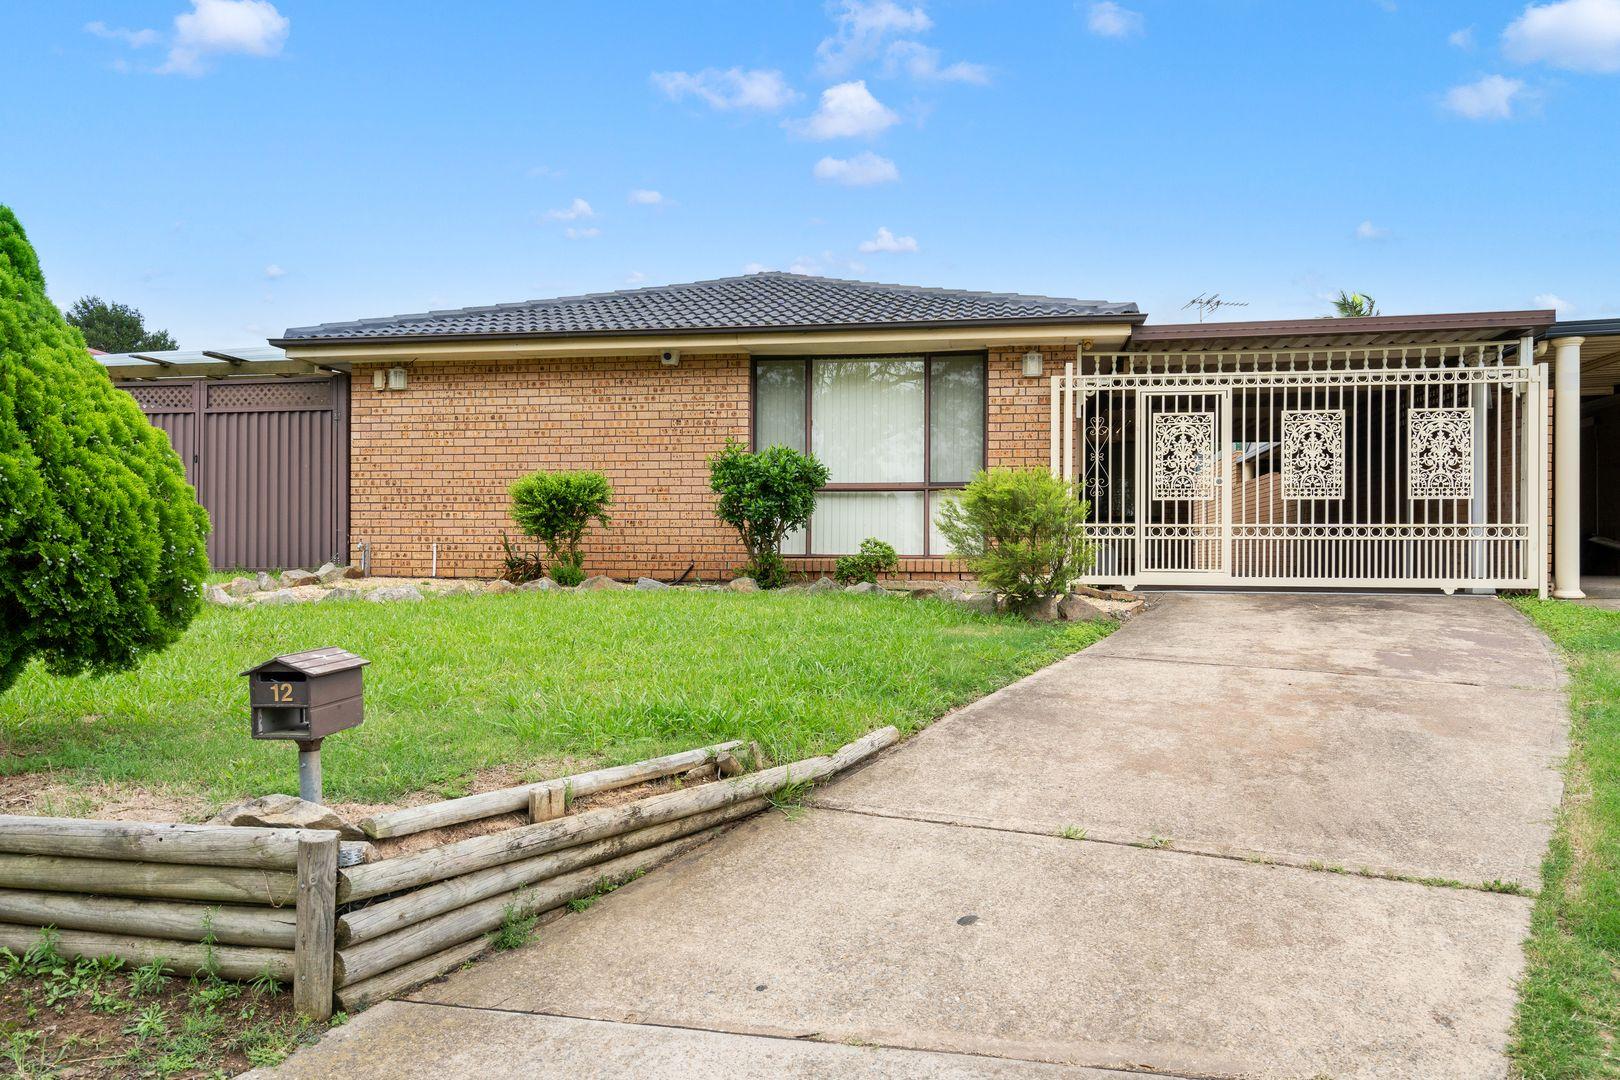 12 GURNEY CRESCENT, Fairfield West NSW 2165, Image 0